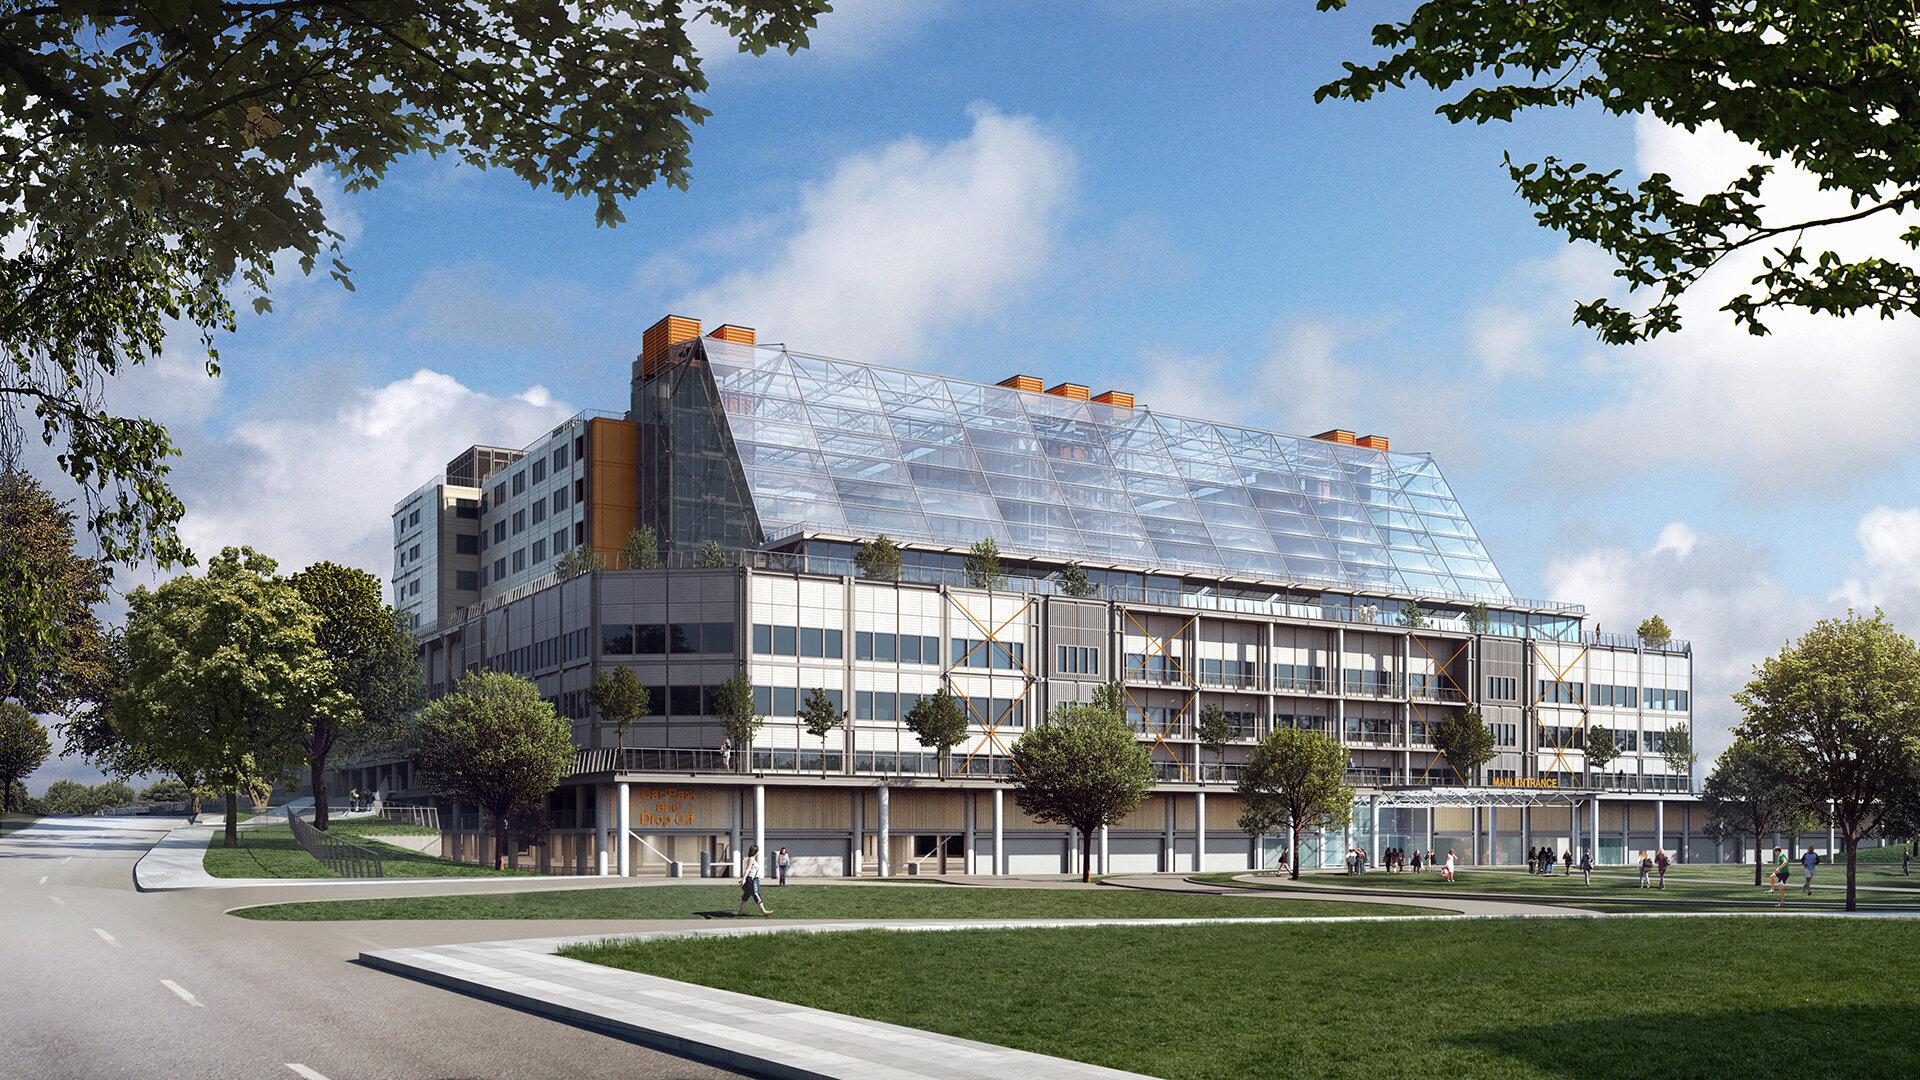 Midland Metropolitan University Hospital